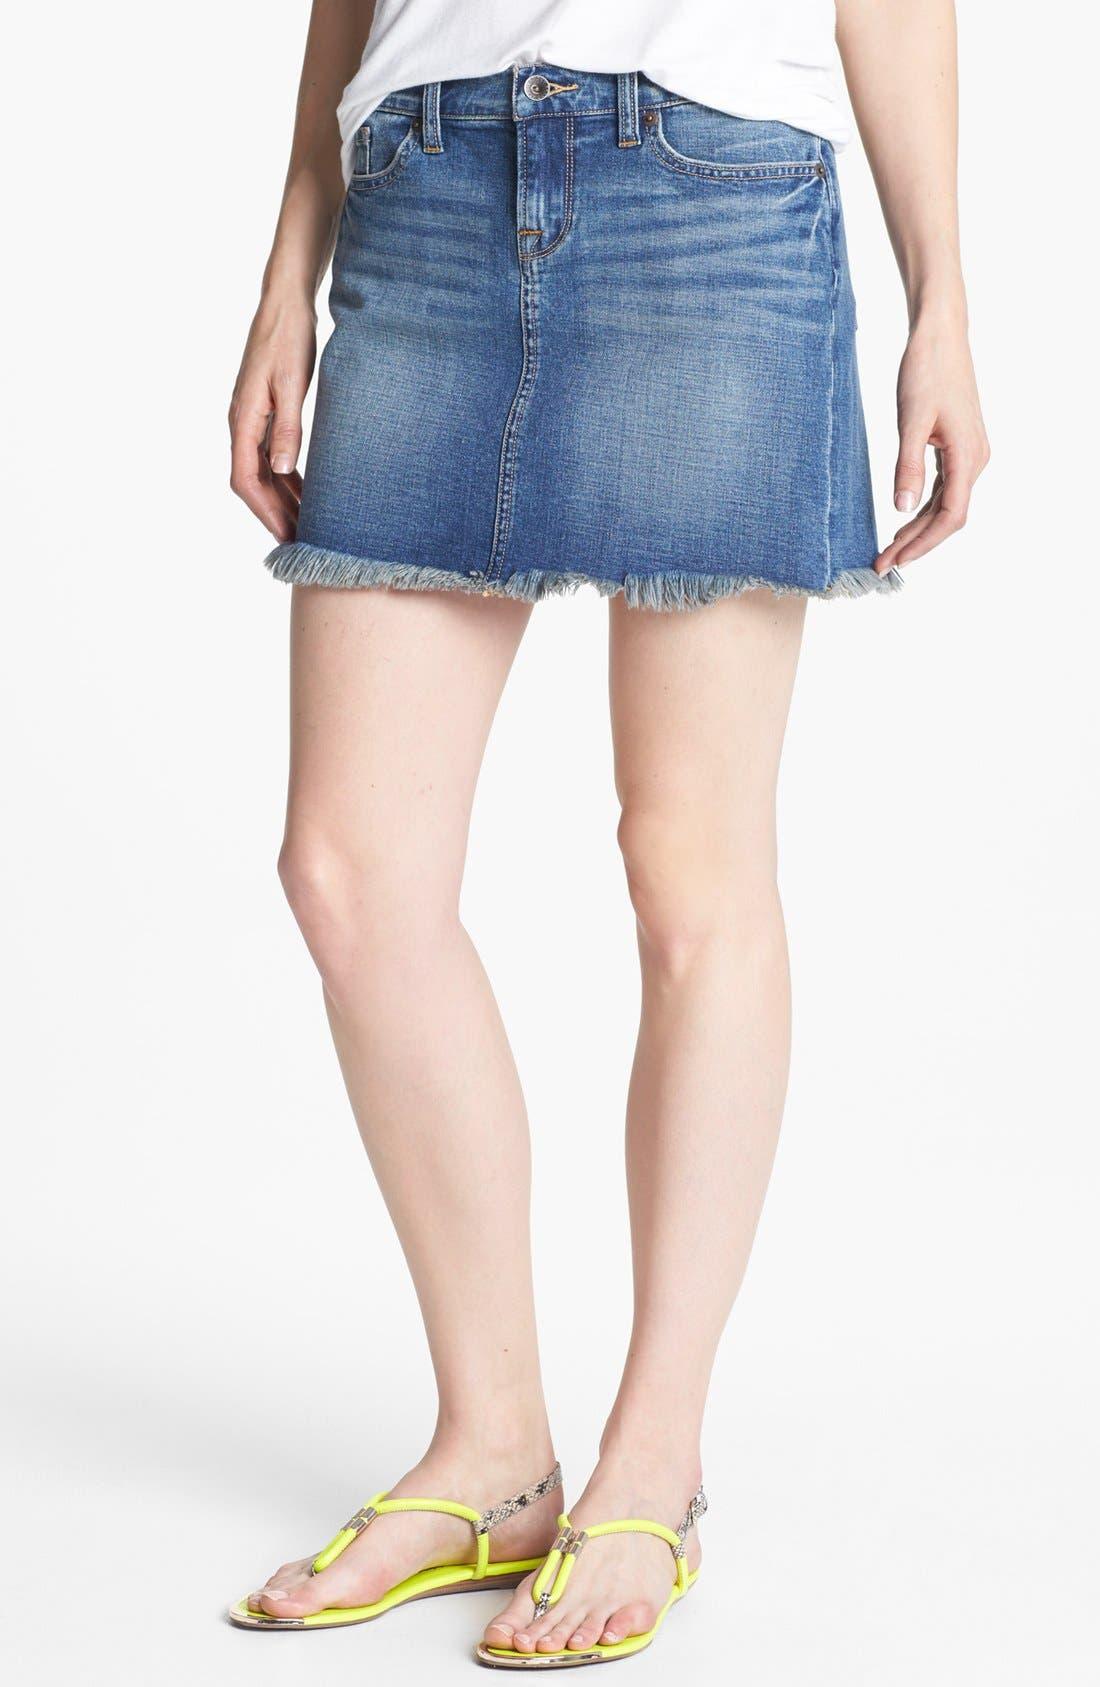 Alternate Image 1 Selected - Lucky Brand 'Blossom' Denim Cutoff Skirt (Online Only)